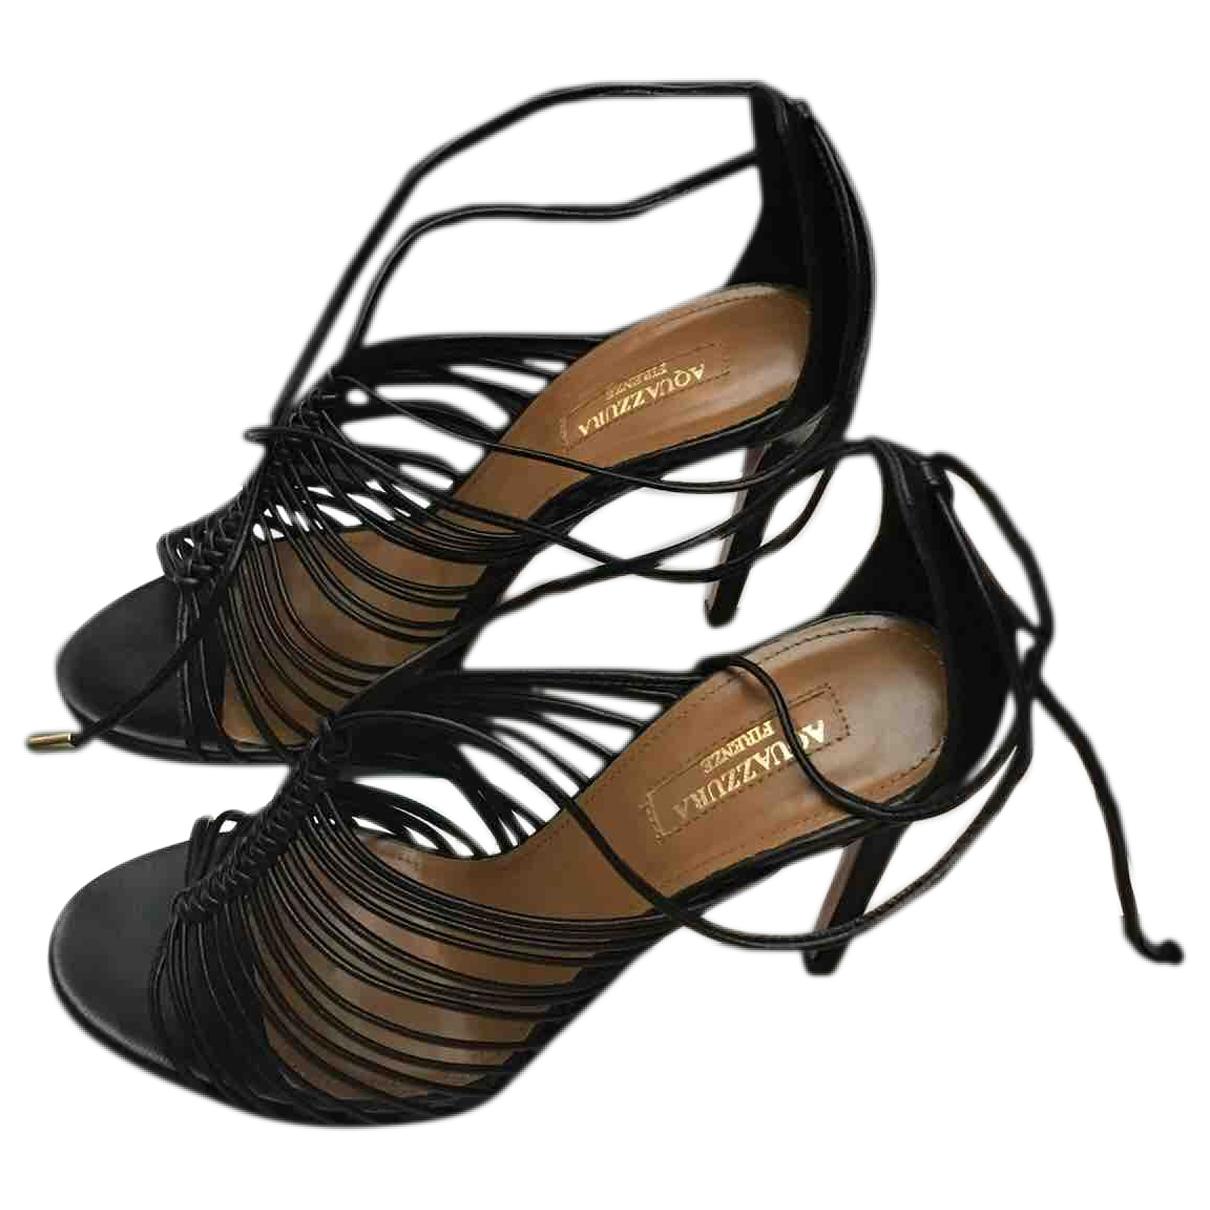 Aquazzura \N Black Leather Sandals for Women 36.5 EU